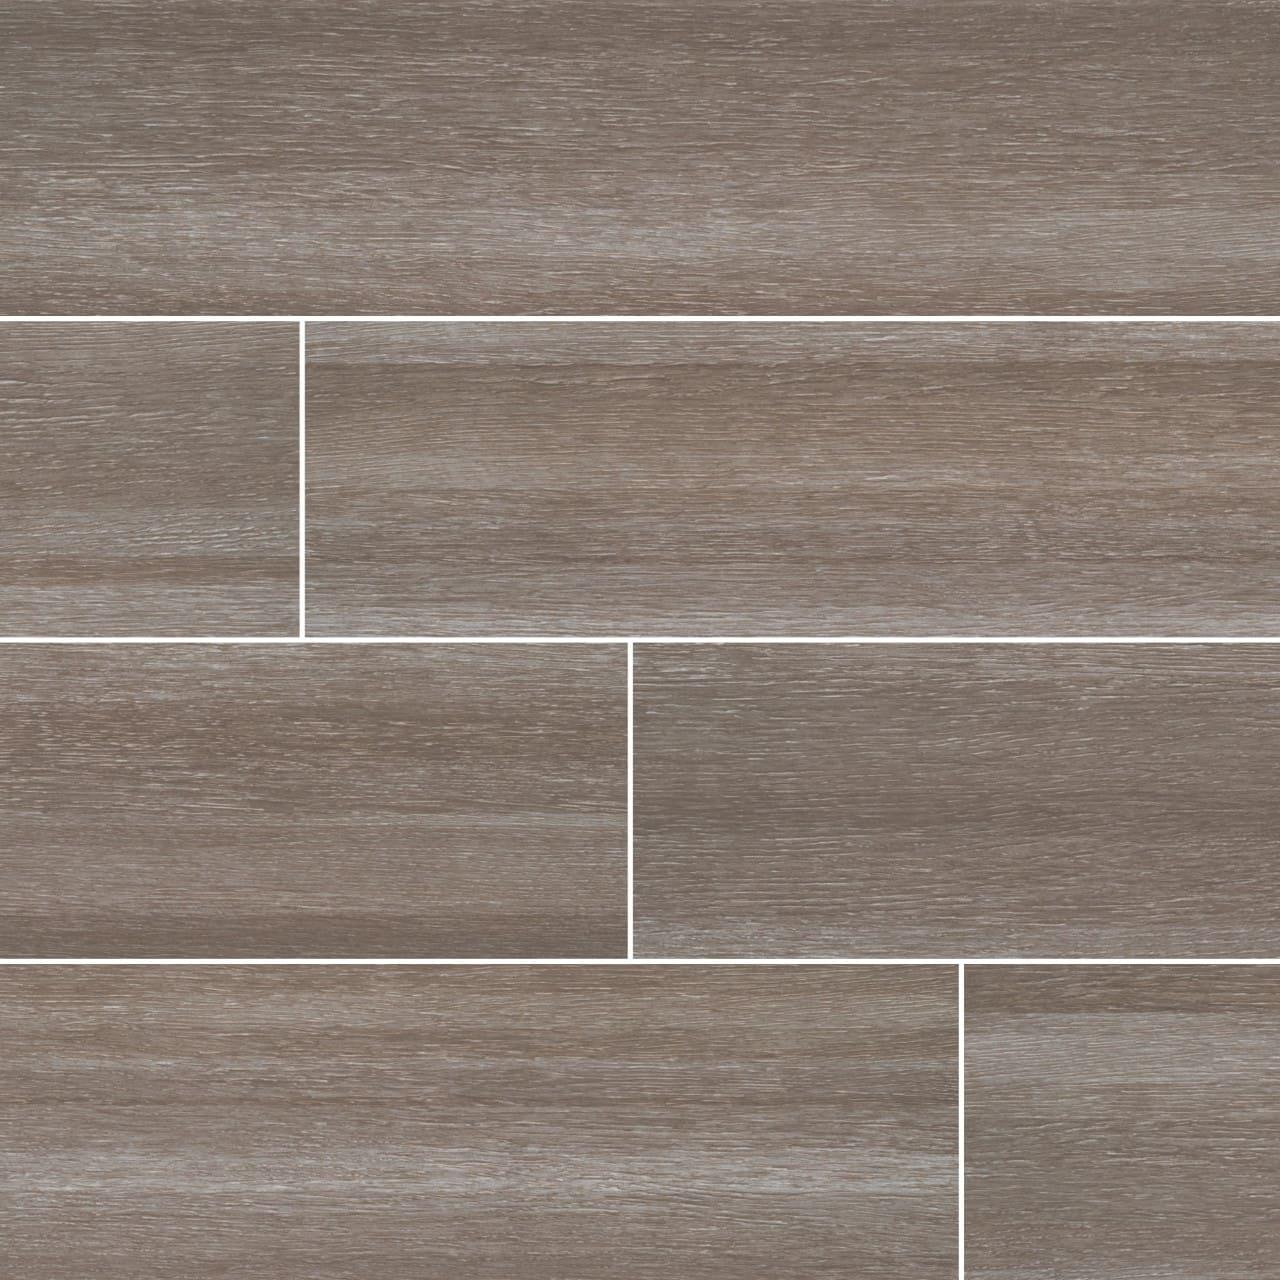 Turin Taupe Ceramic Wood Look Tile